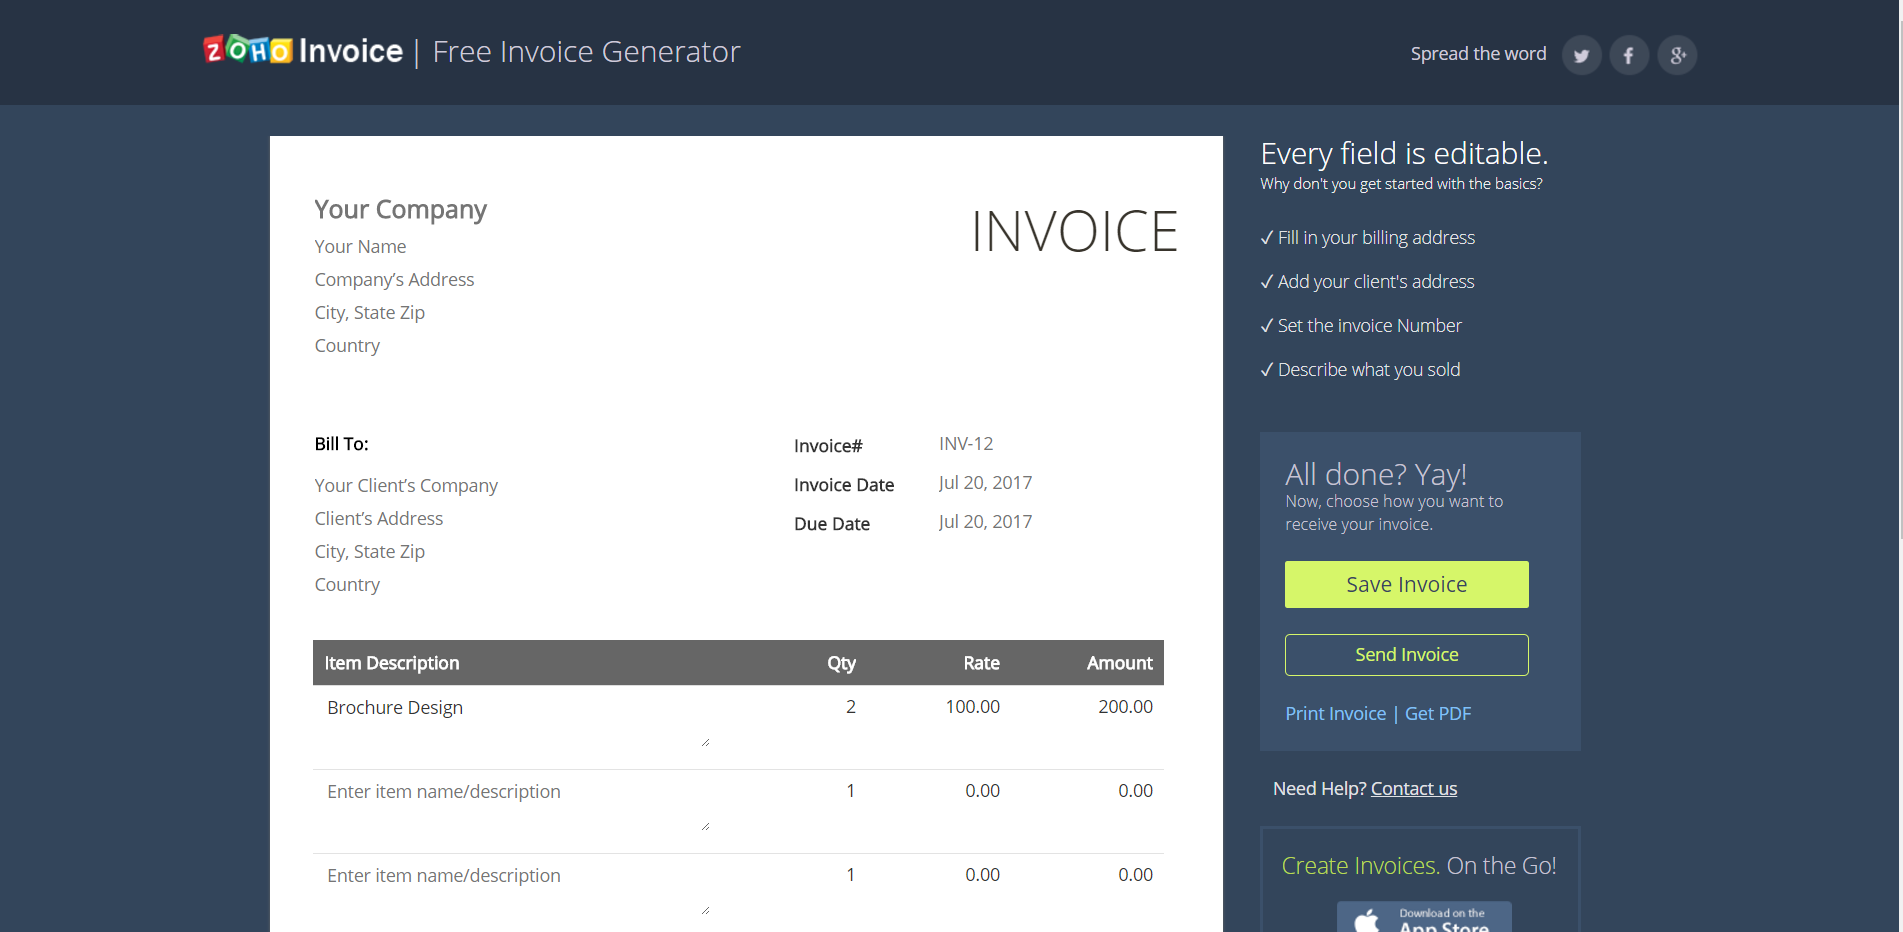 Best Free Invoice Generators - Free invoice generator zoho